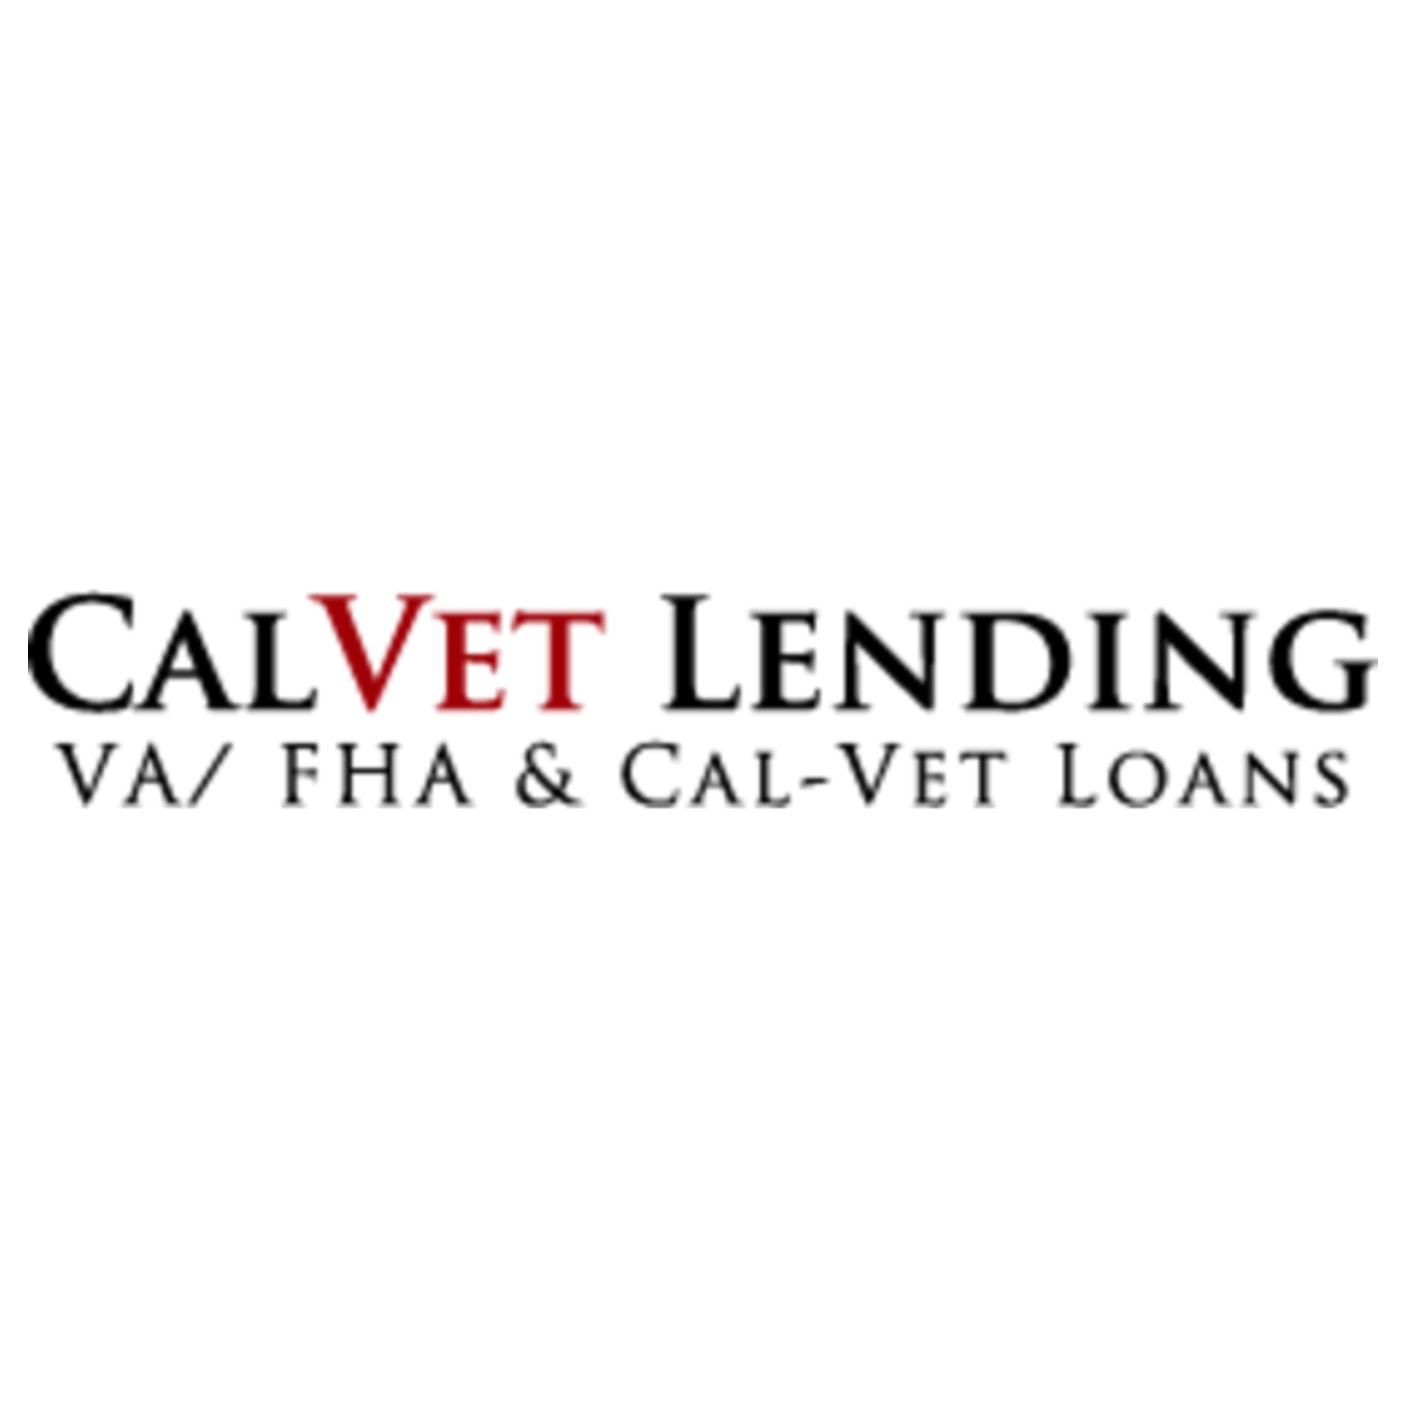 Noreen Smith, Cal Vet Lending